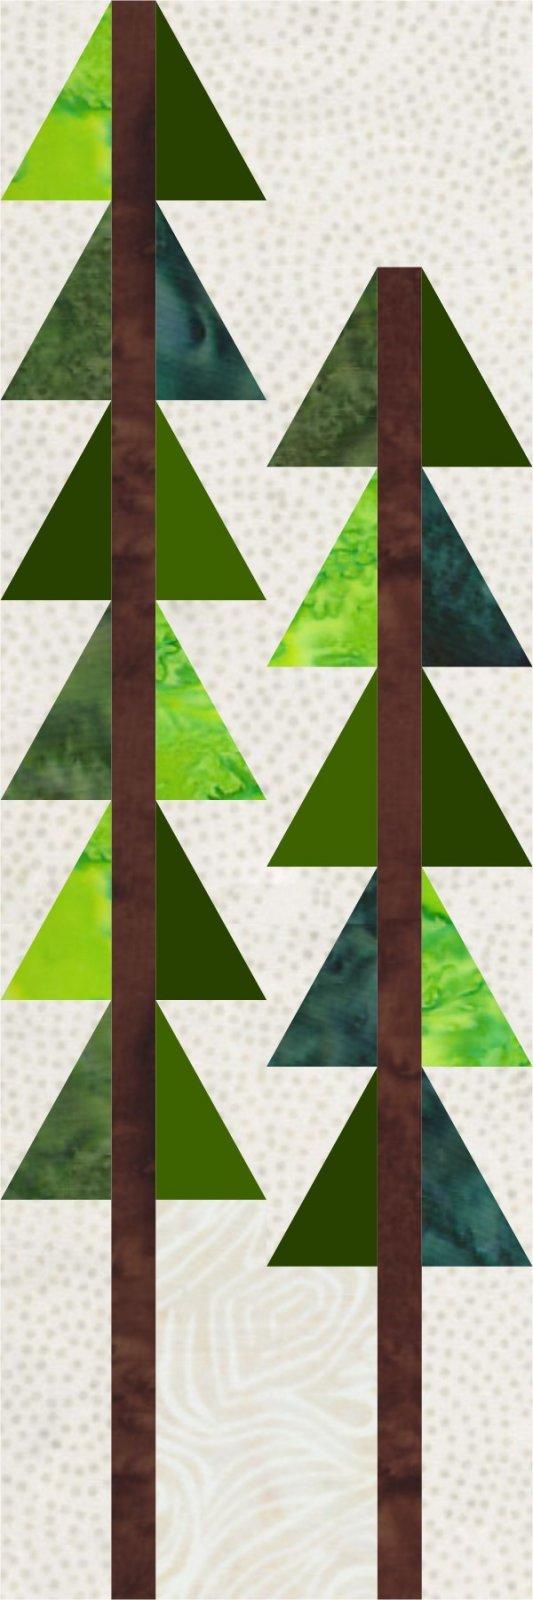 Season of Lights Bonus Block 4 - Two Pine Trees